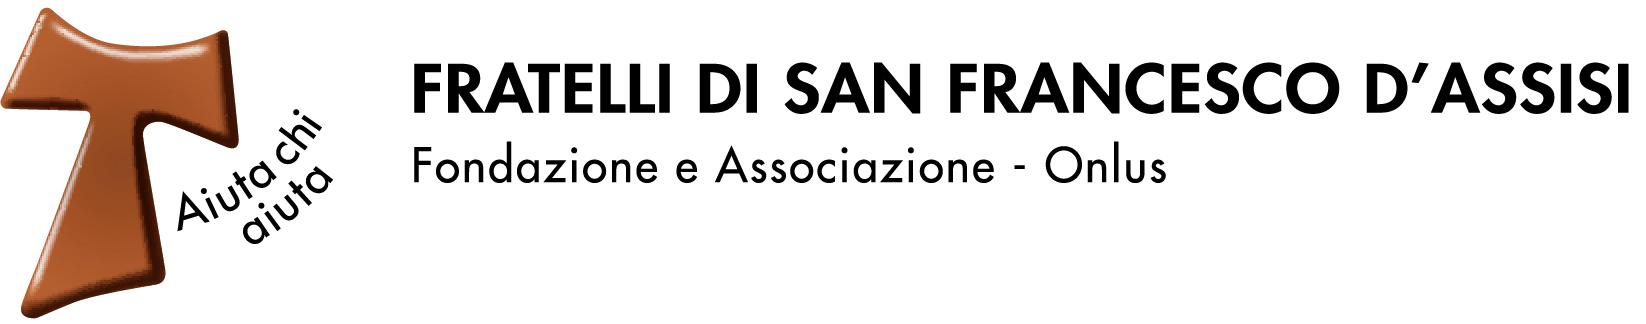 Fratelli di San Francesco d'Assisi